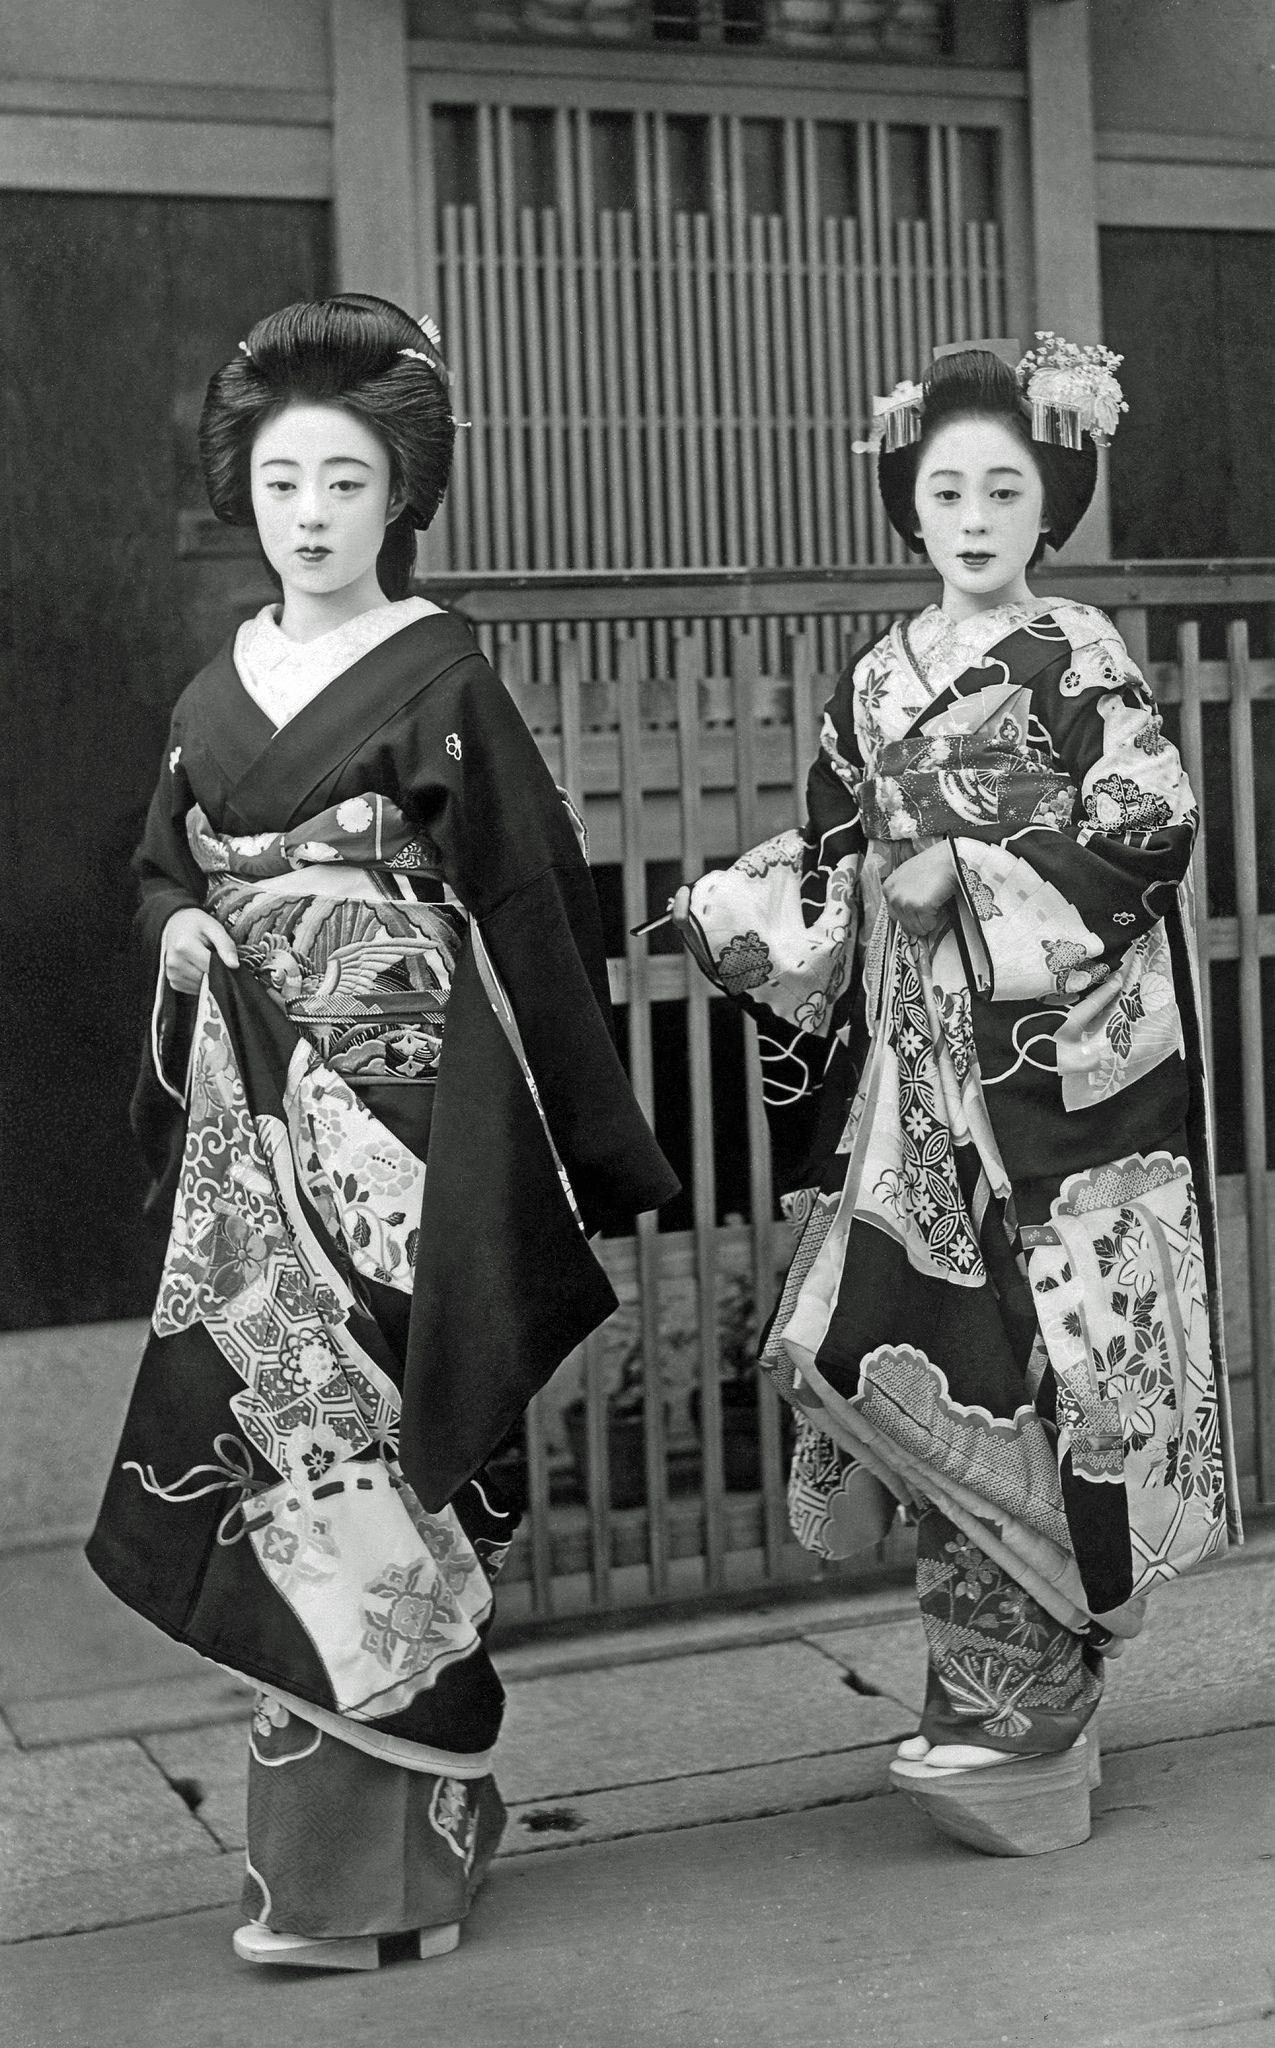 https://flic.kr/p/BAzxTL   Geiko Kokaji and Friend 1940s   Geiko (geisha) Kokaji, on the left, together with a maiko (apprentice geisha), in the 1940s or early 1950s. Kokaji appears in the 1939 Miyako Odori (Cherry Dance) programme, as a maiko.